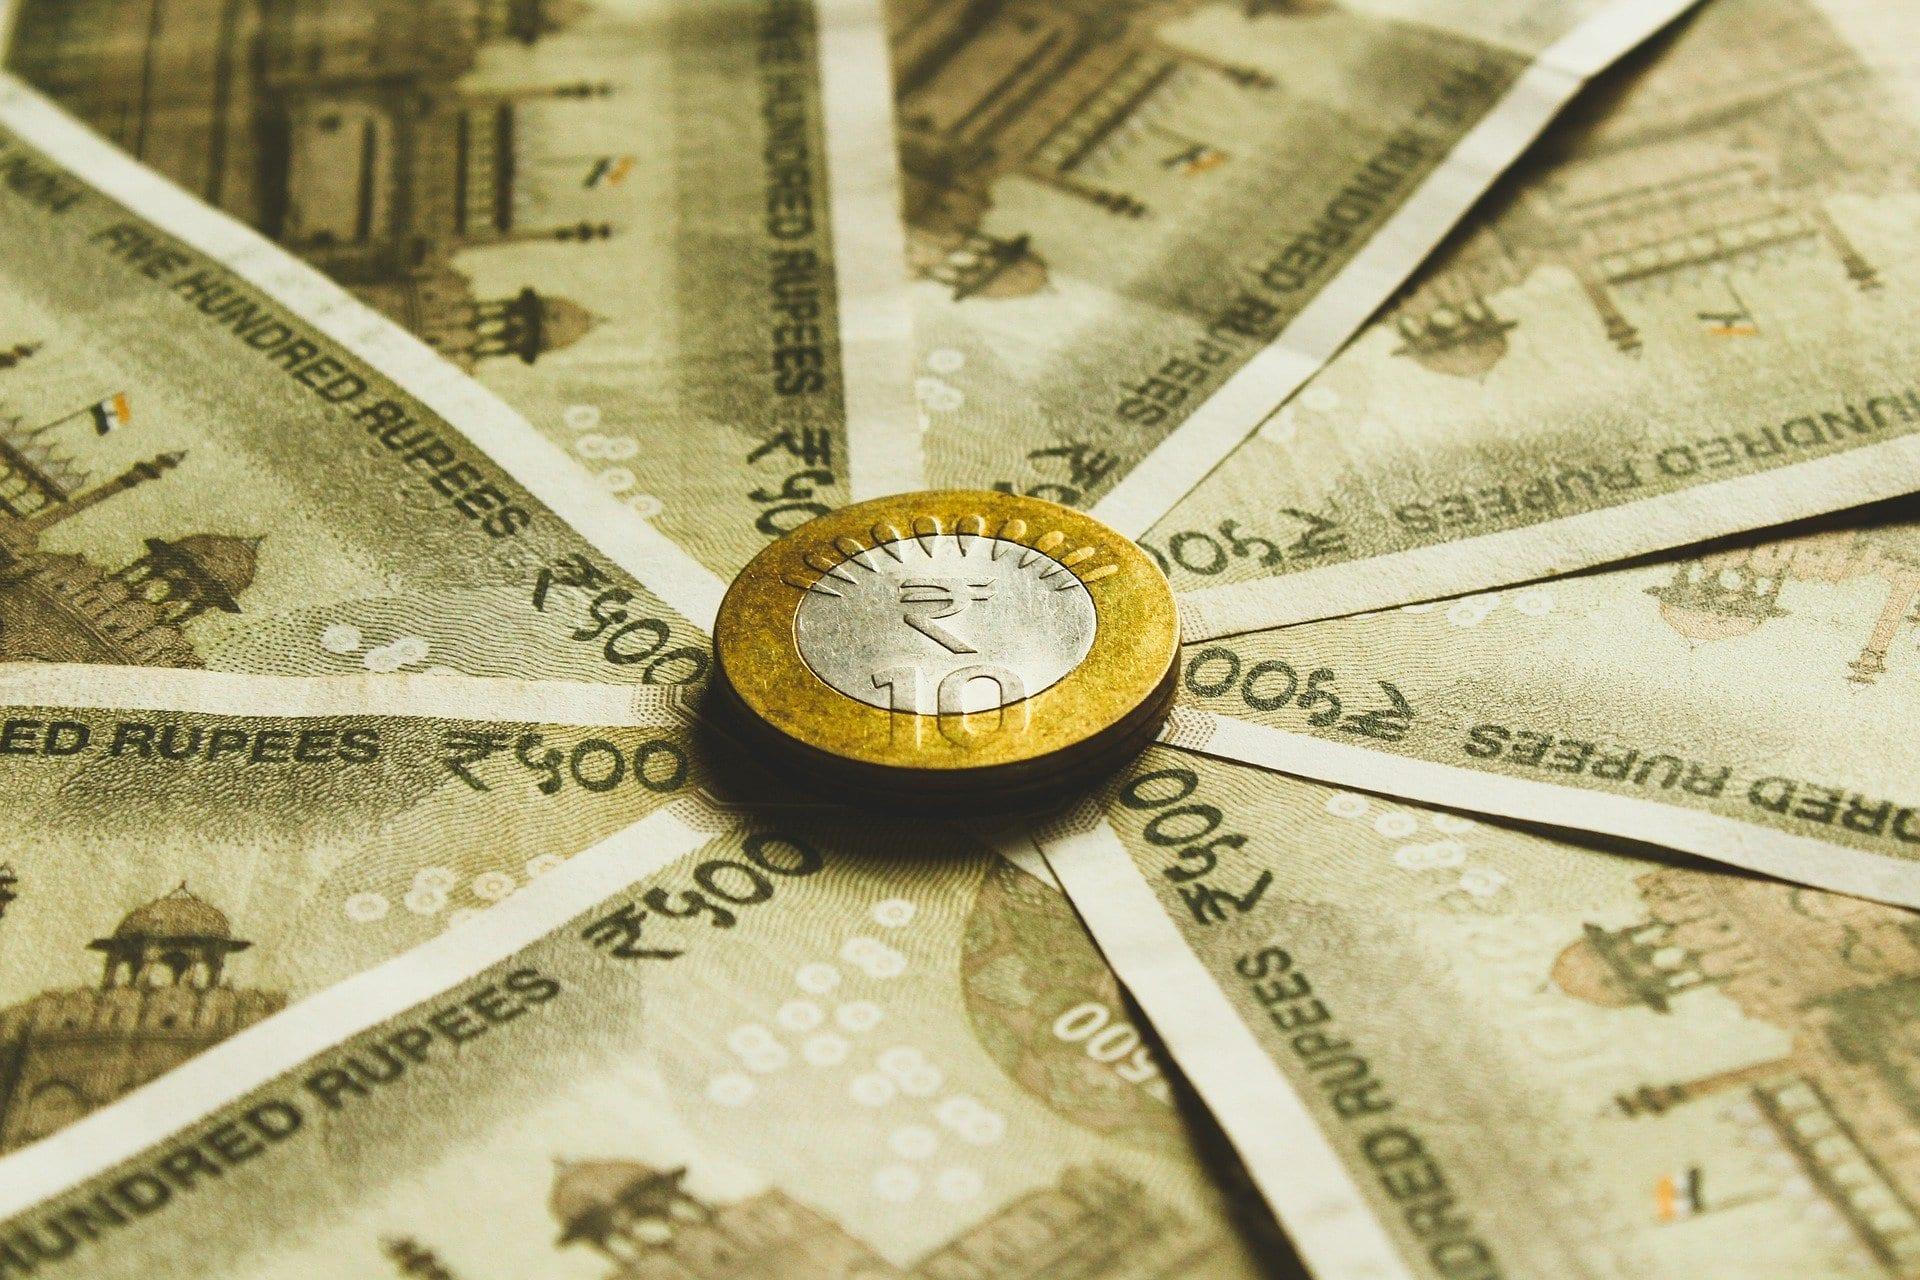 HDFC Bank Savings Account Interest Rates & Minimum Balance